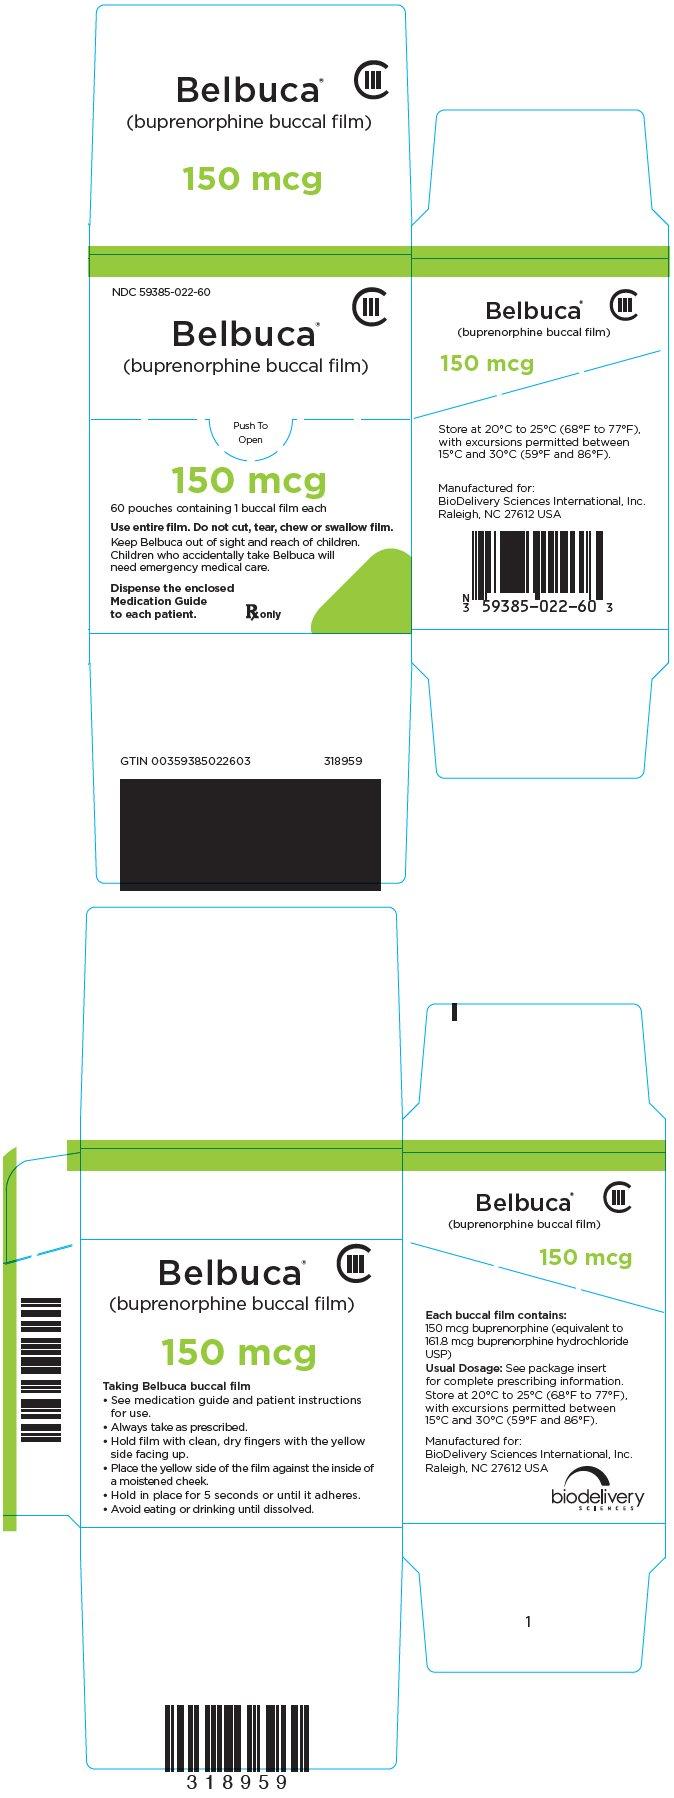 Belbuca - FDA prescribing information side effects and uses